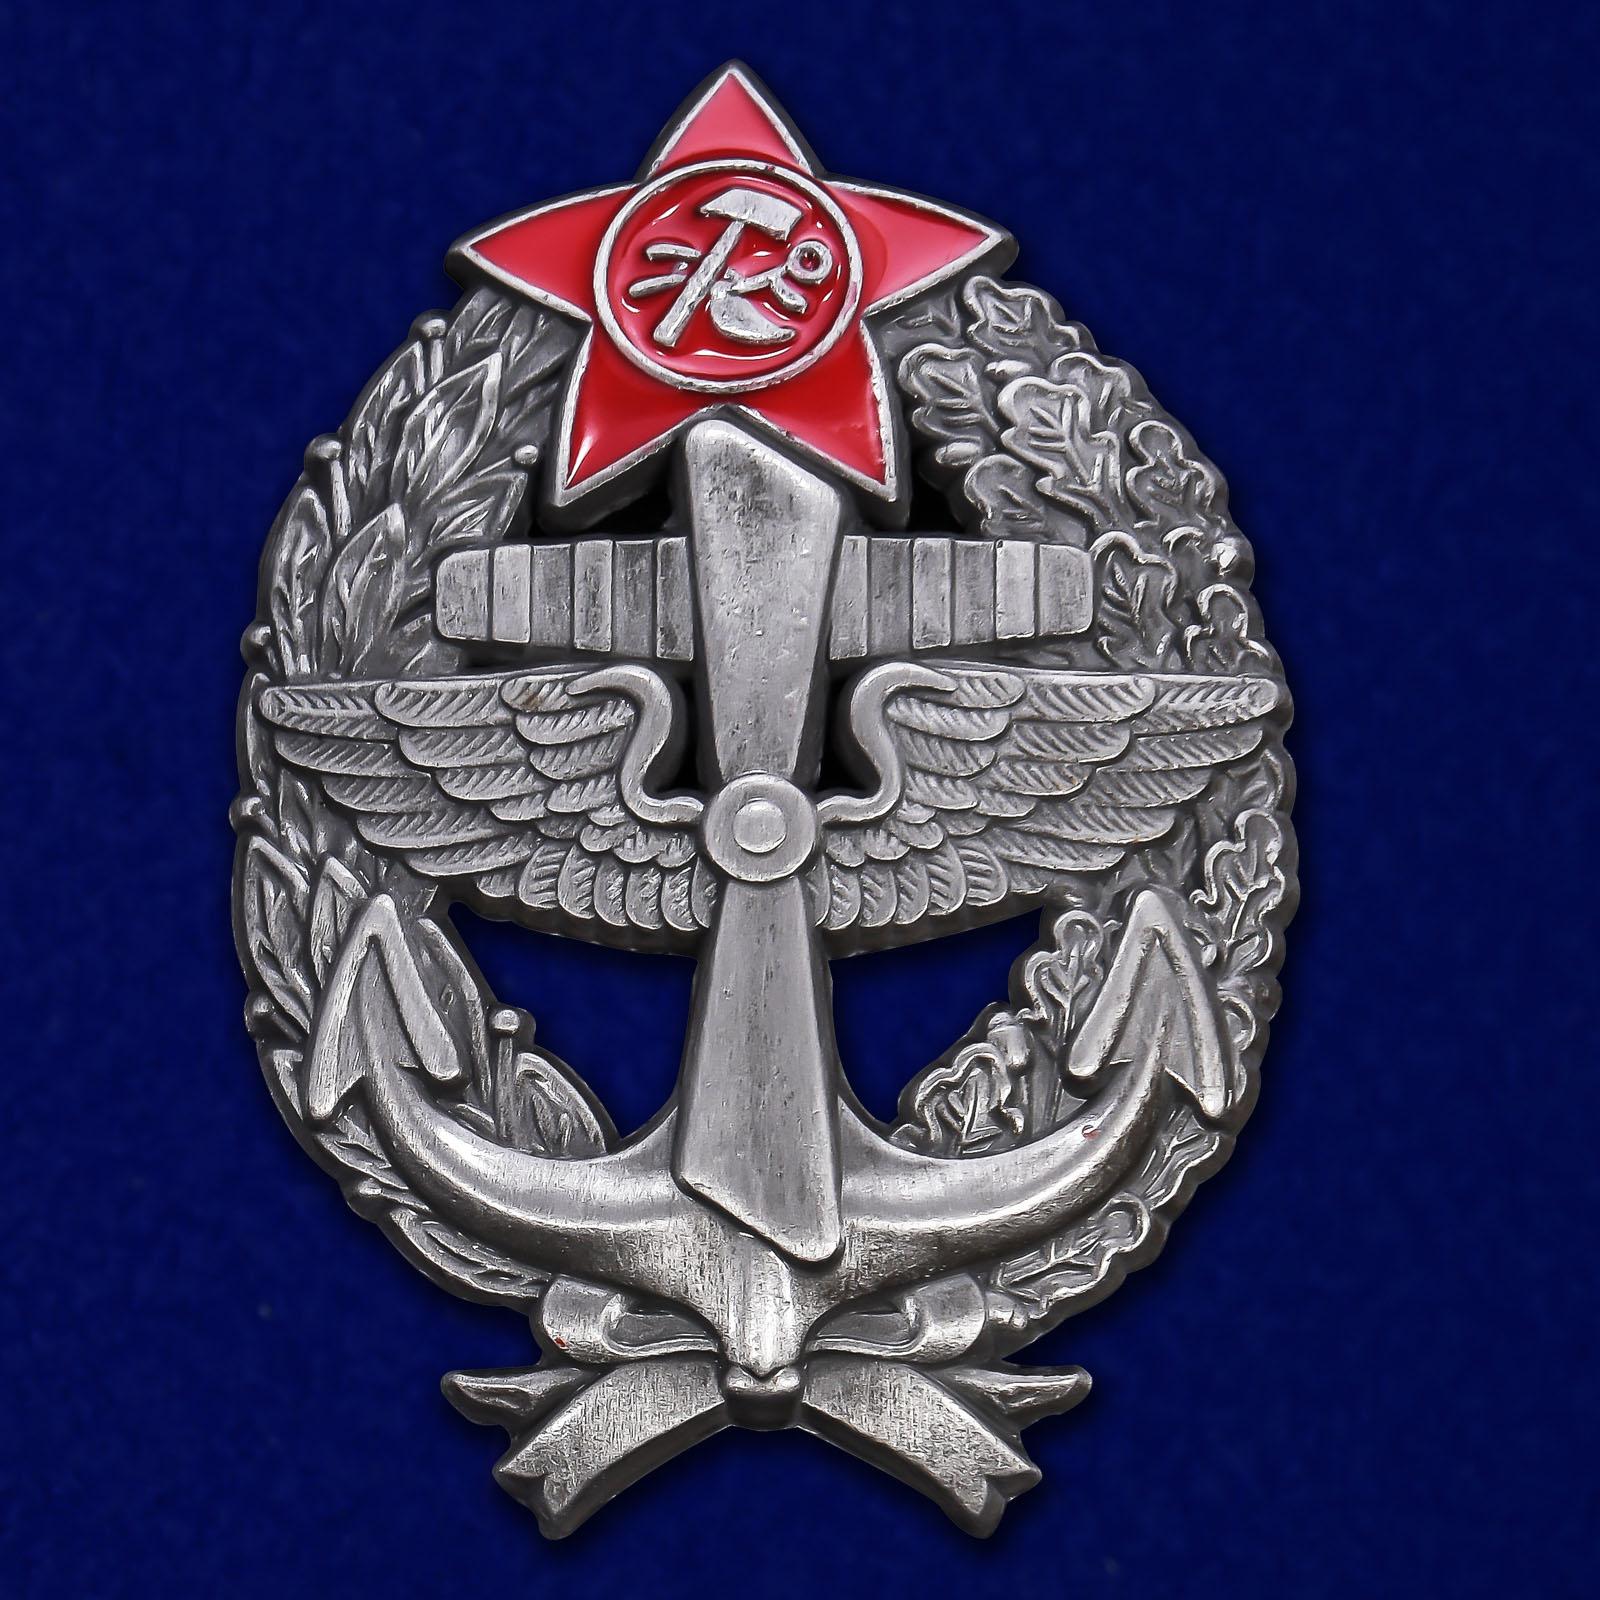 Знак Красного командира - морского лётчика